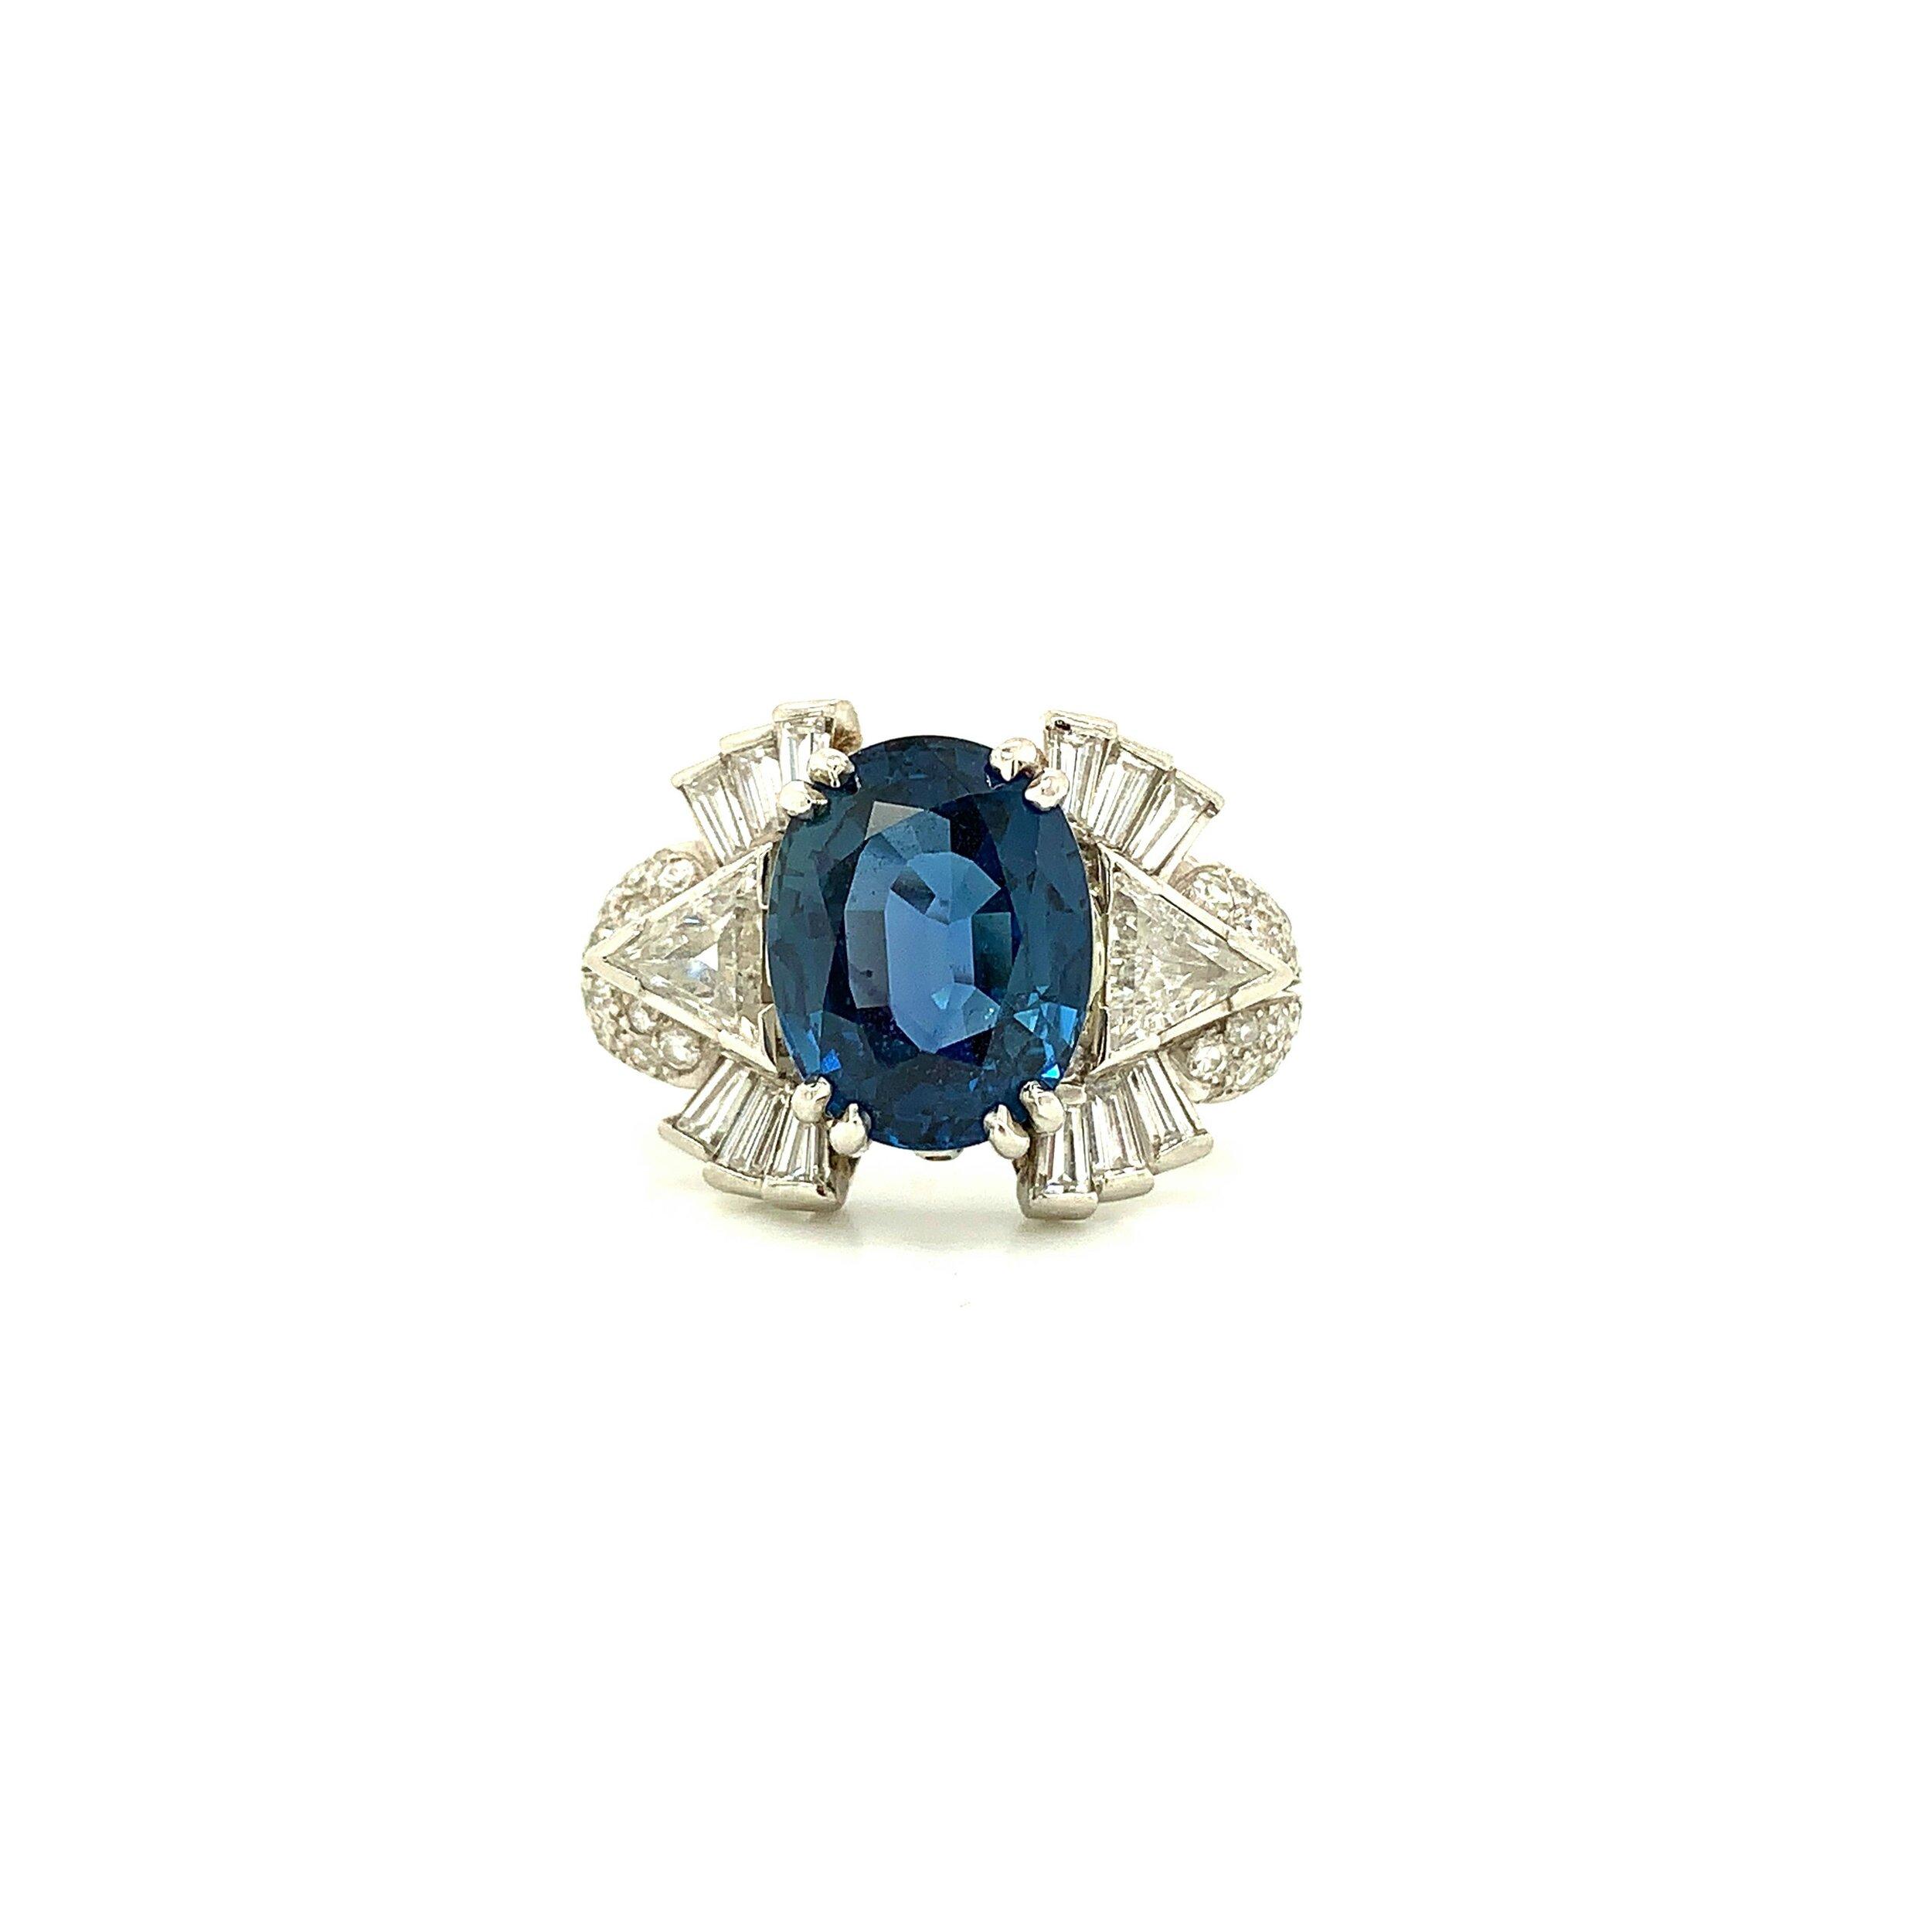 6.21ct Certified Sapphire Starburst Ring with 2.20ct Diamonds set in Platinum   Est. US$ 5,000-6,500